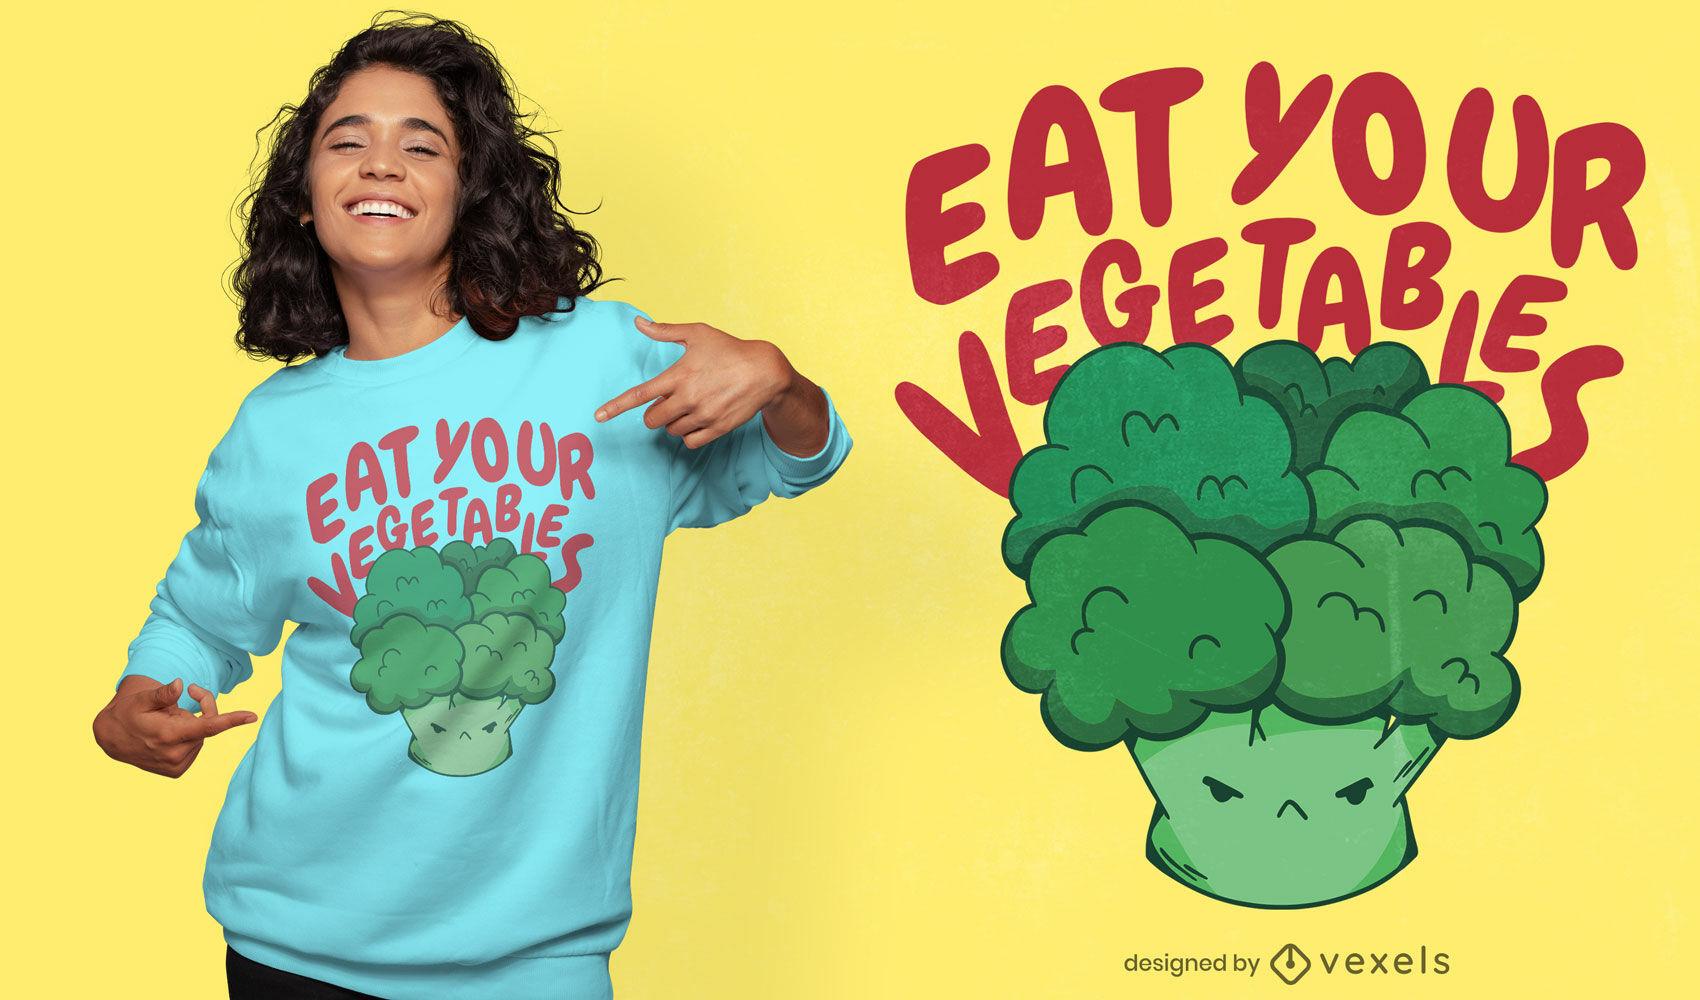 Eat your vegetables t-shirt design